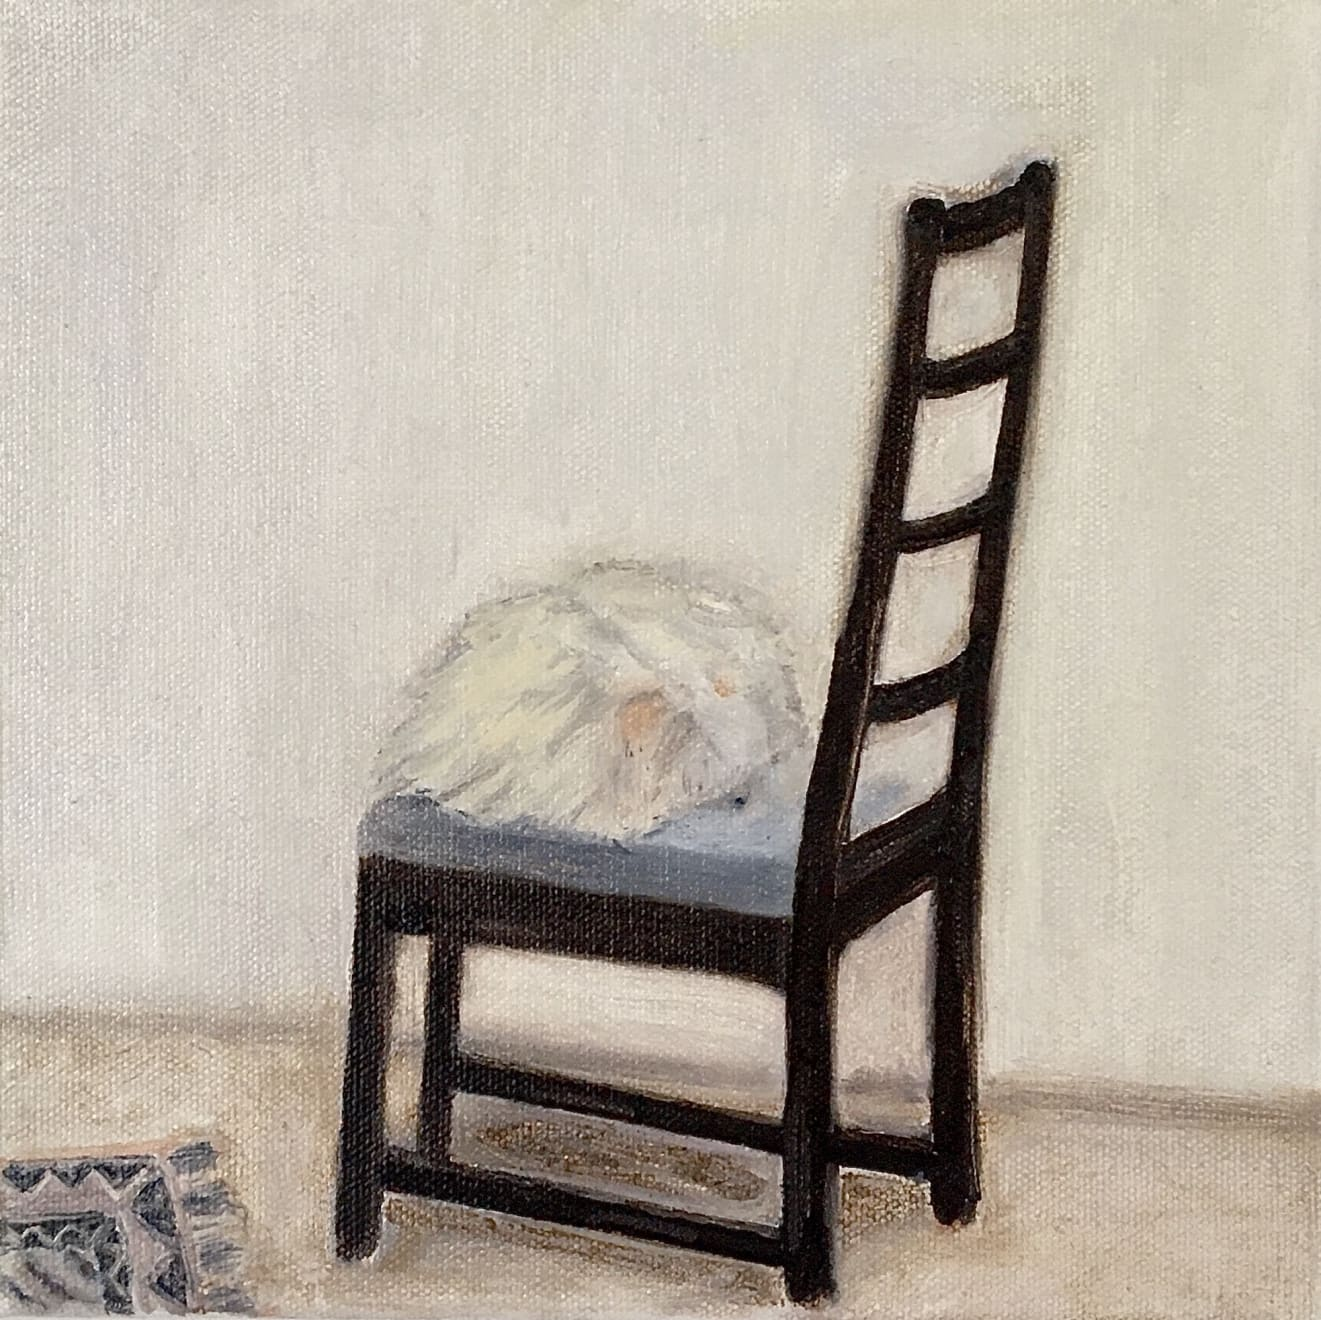 Elynor Smithwick Sleeping Oil on Canvas Original 20 x 20 cm $750 £375 SOLD